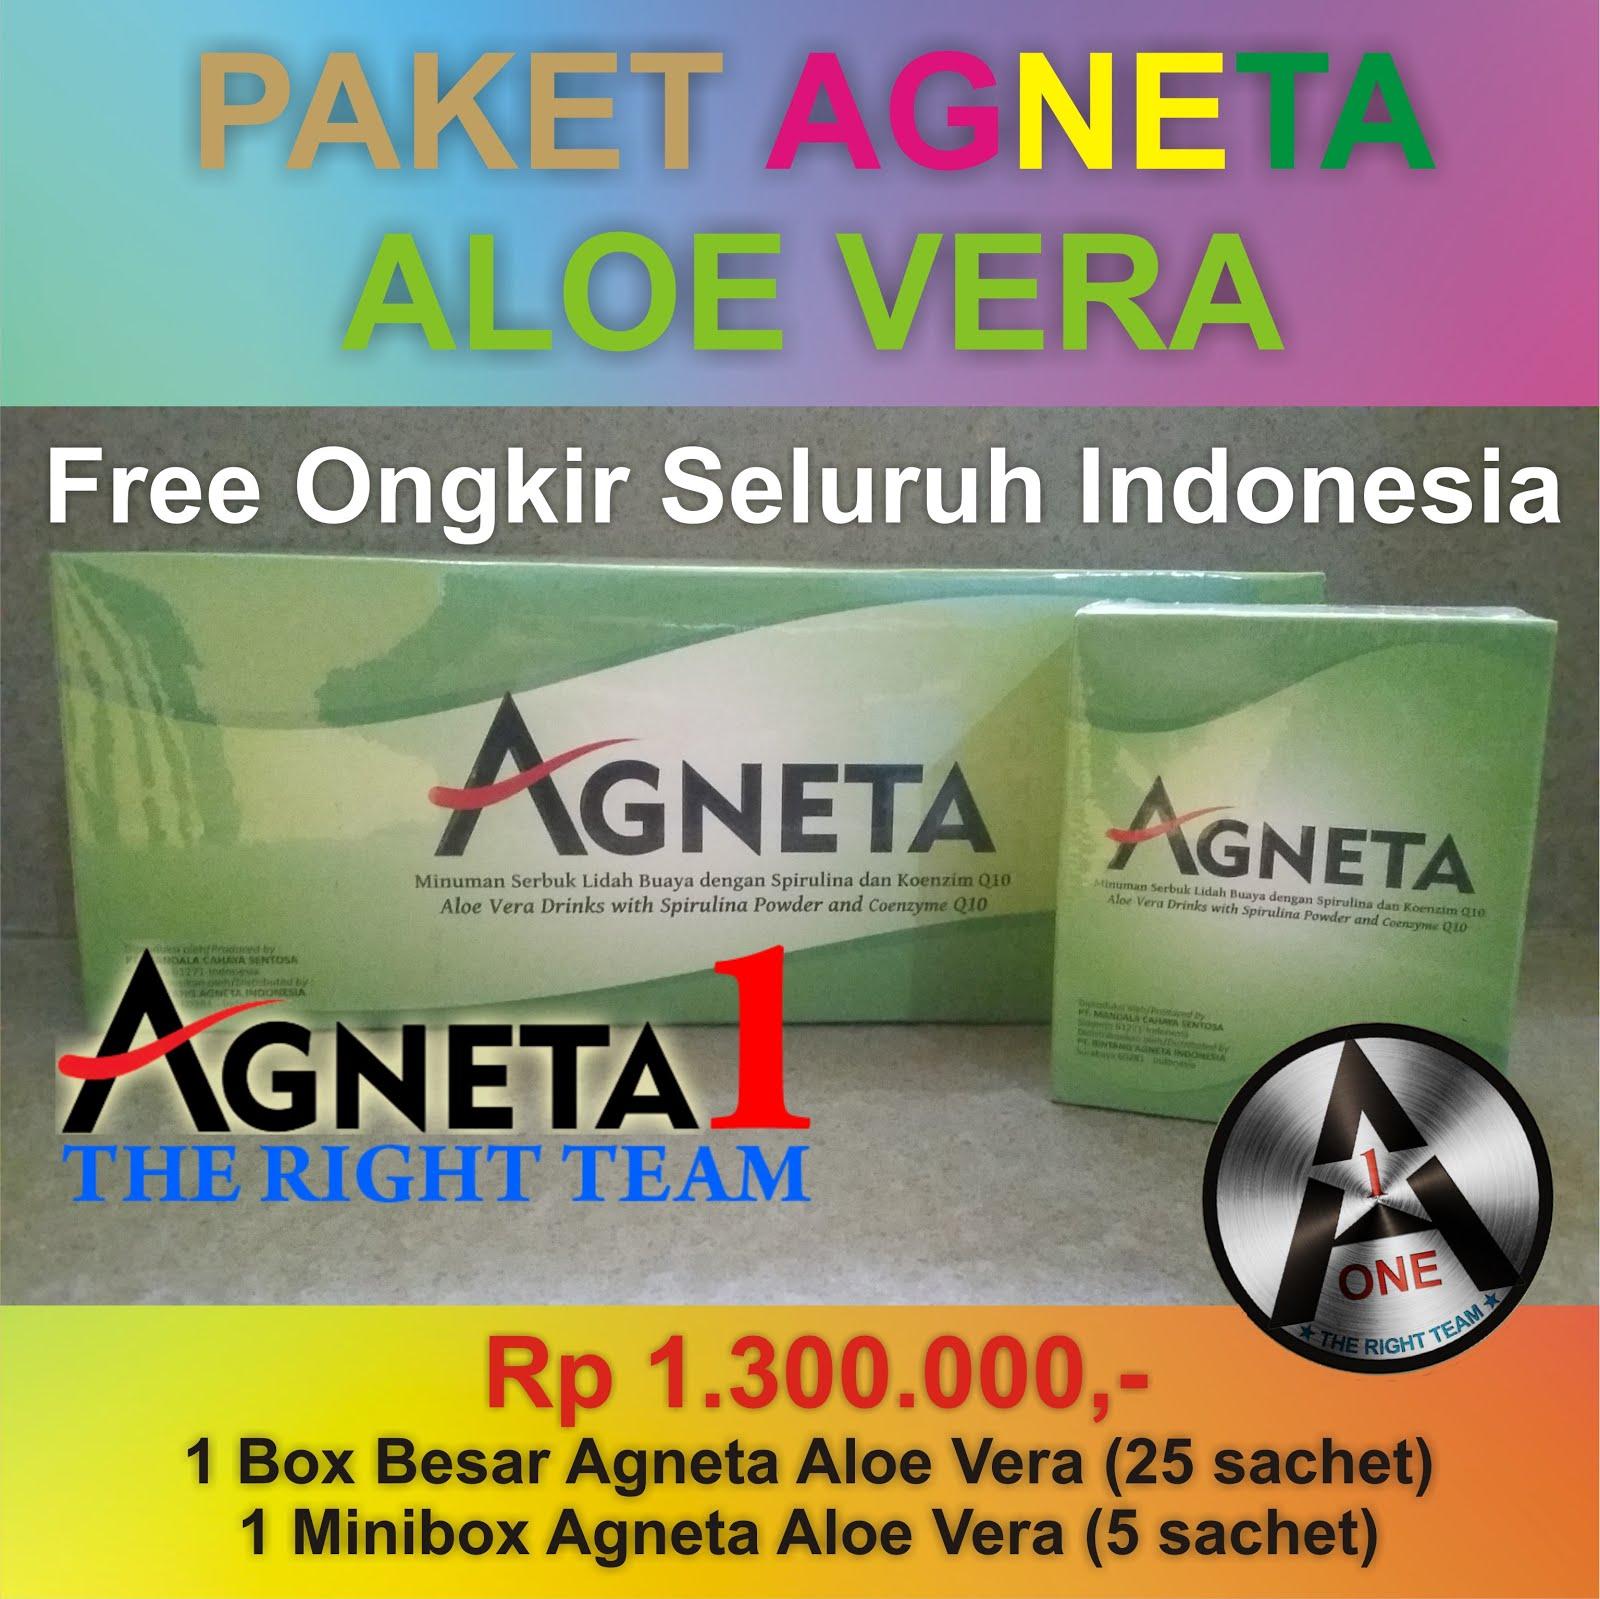 Paket Agneta Aloe Vera (Pelangsing)